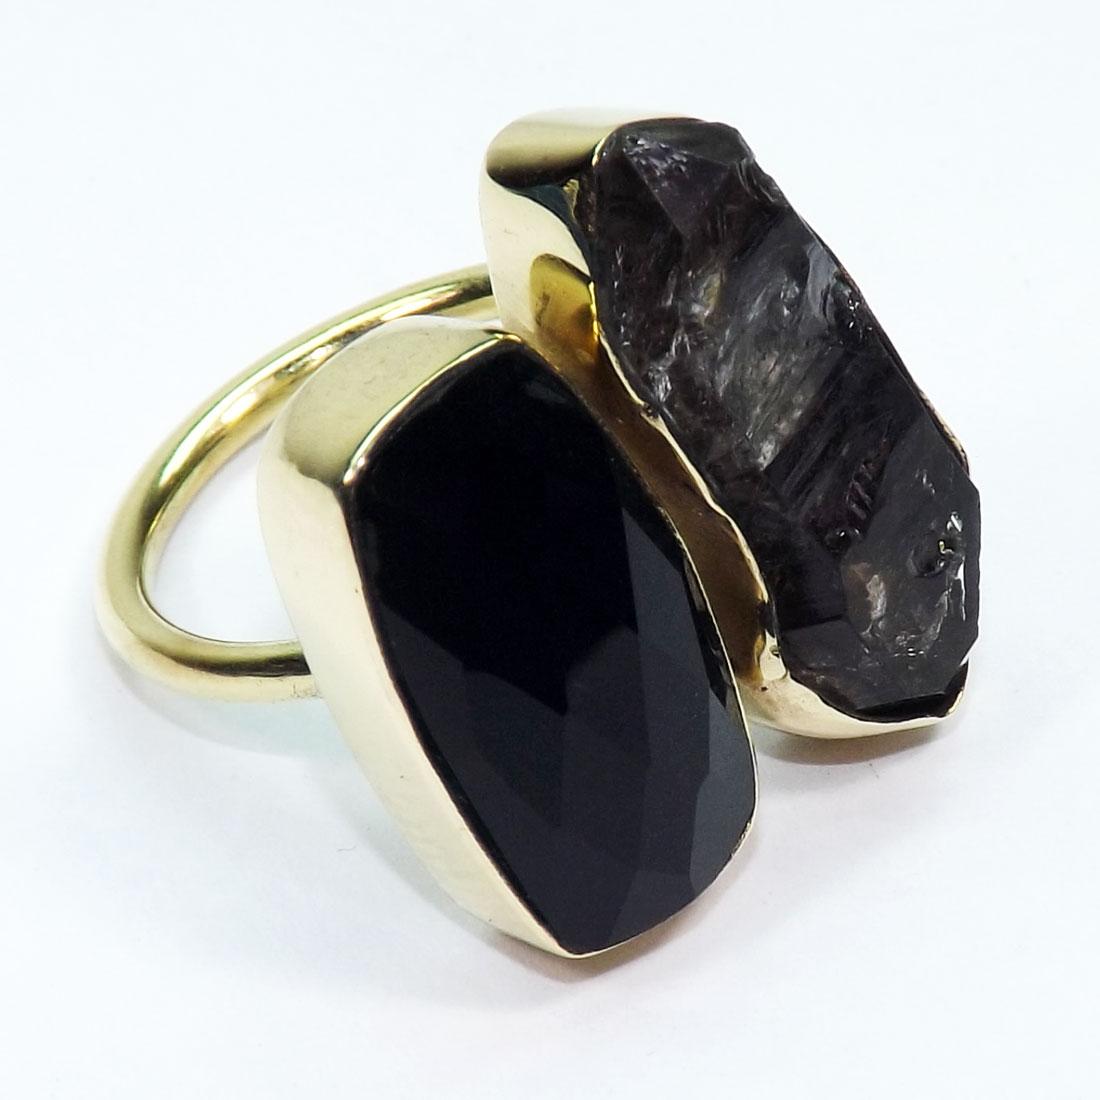 Black Oxidized Brass Adjustable Ring with a 2018mm Raw Herkimer Diamond